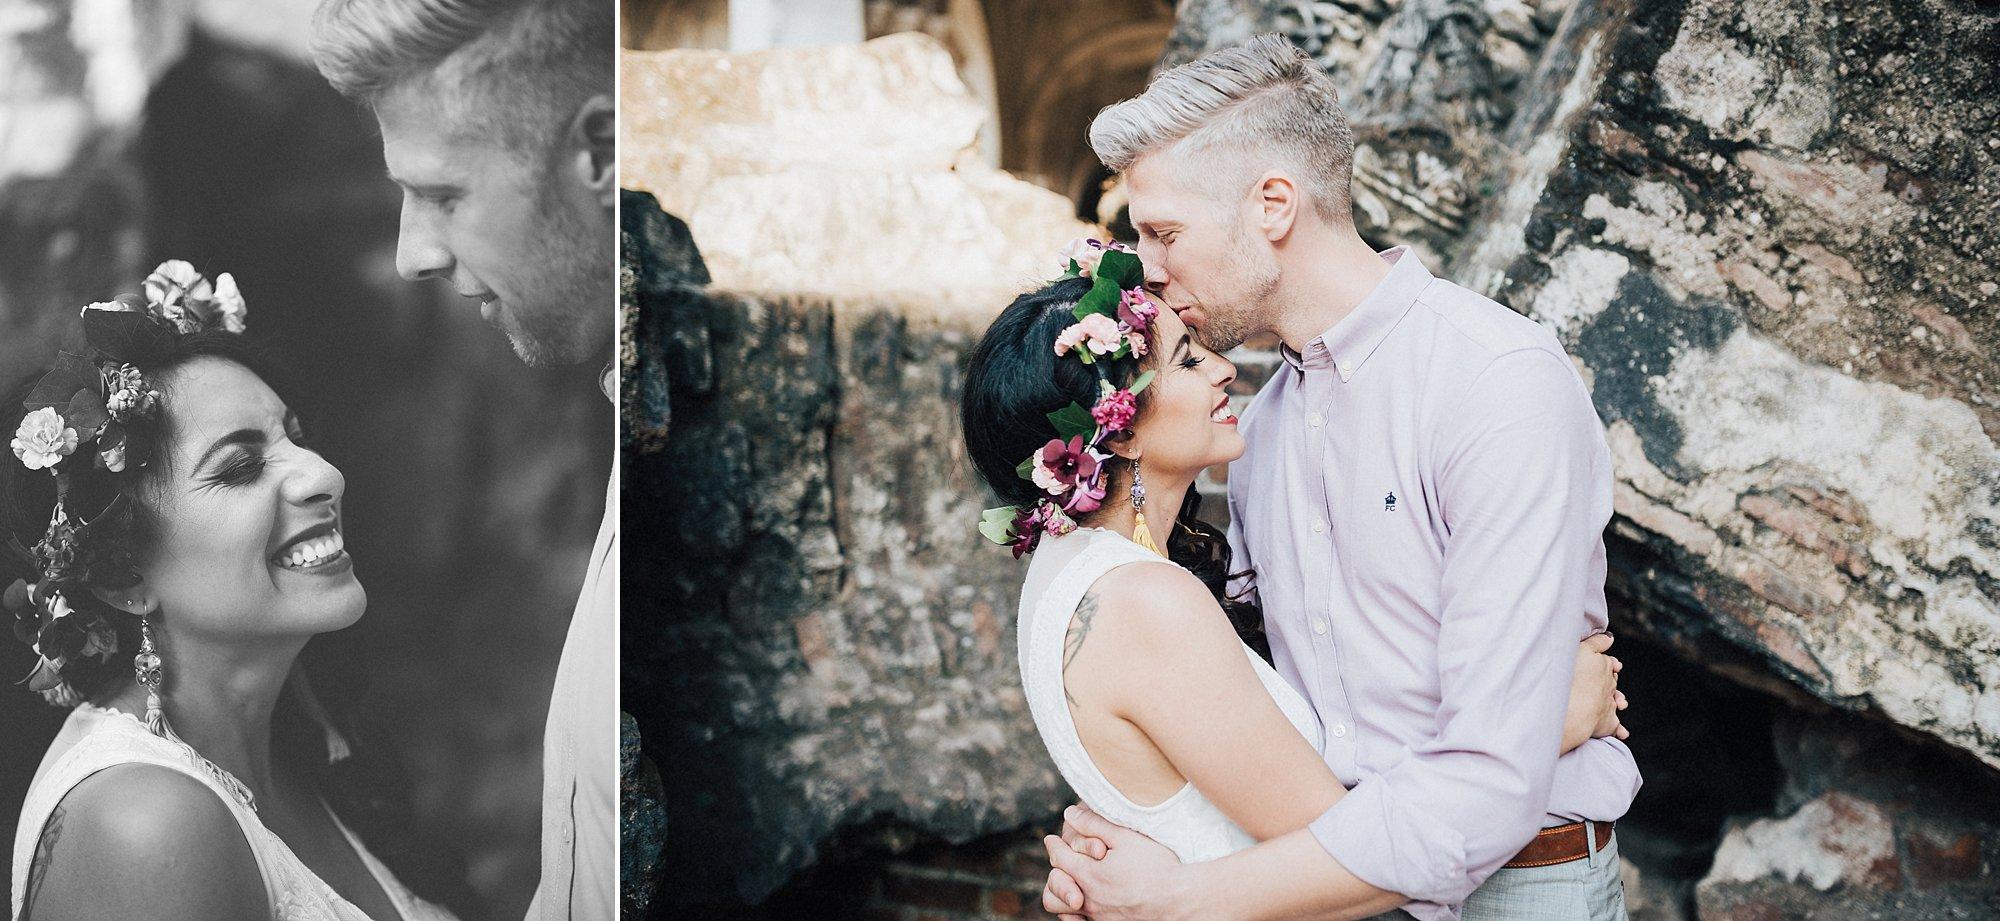 alex-yazmin-wedding-photographer-antigua-guatemala-017